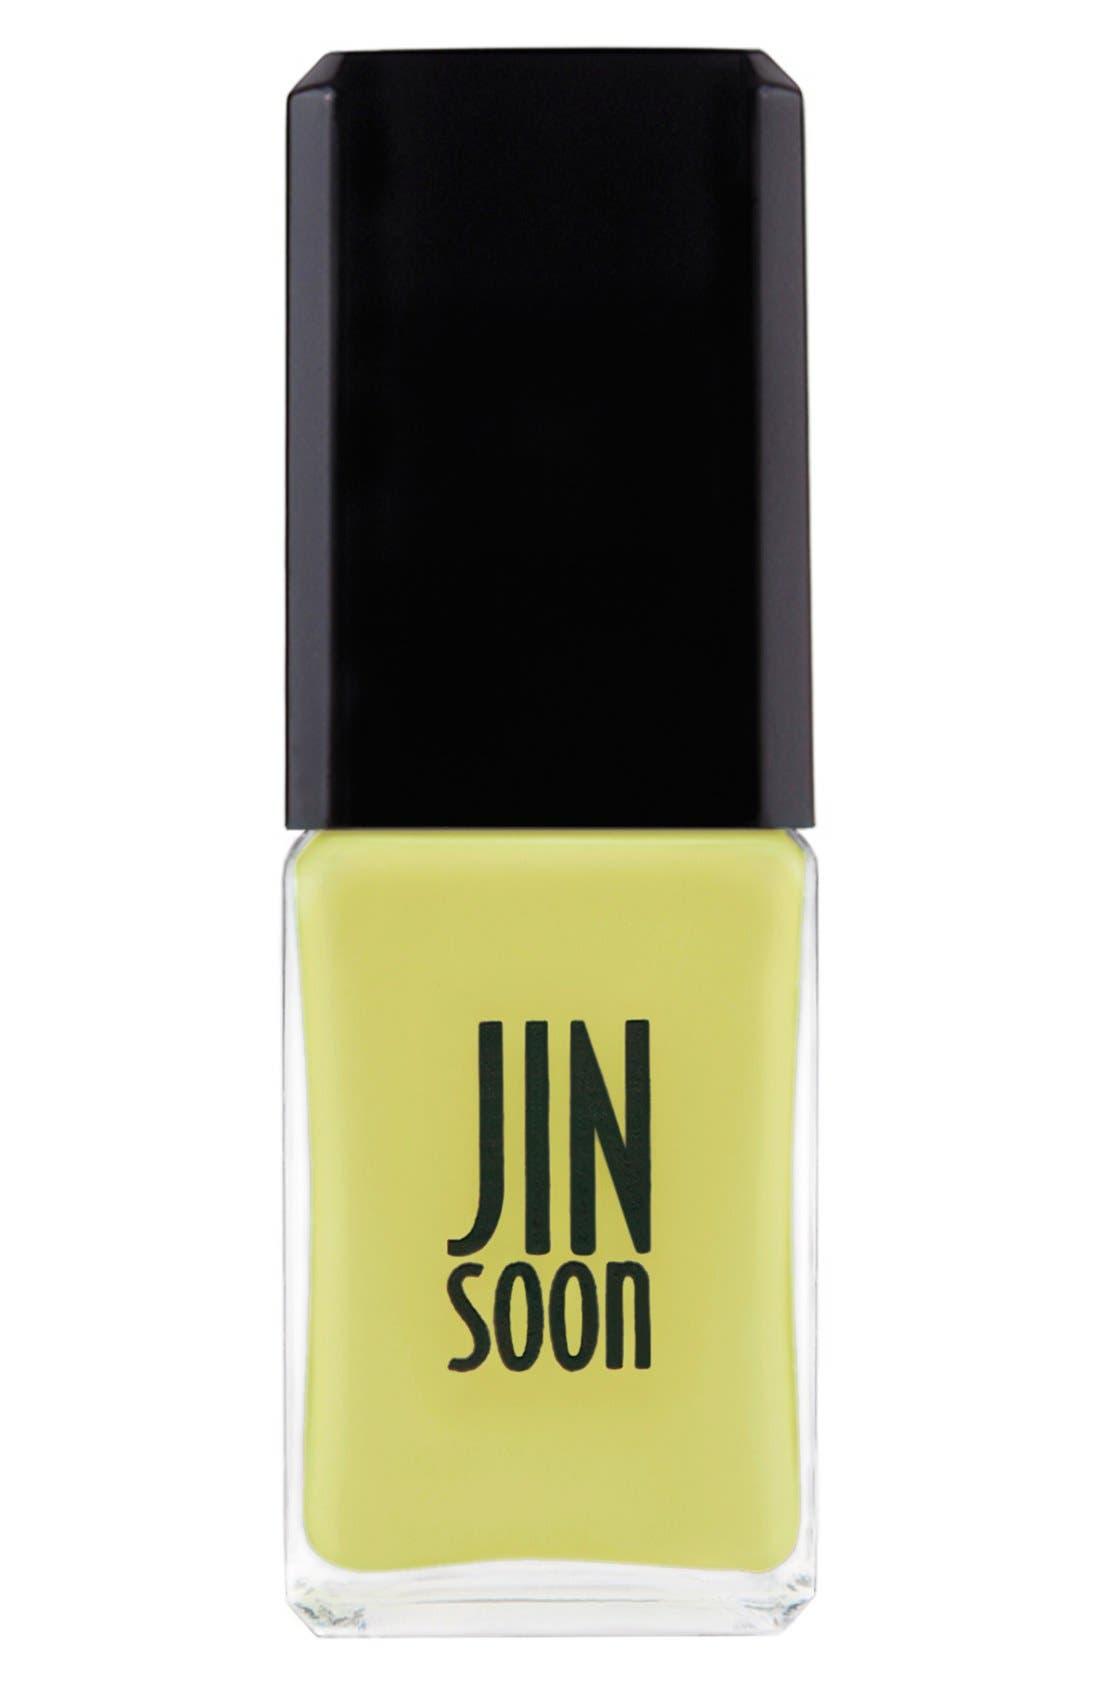 JINsoon 'Charme' Nail Polish